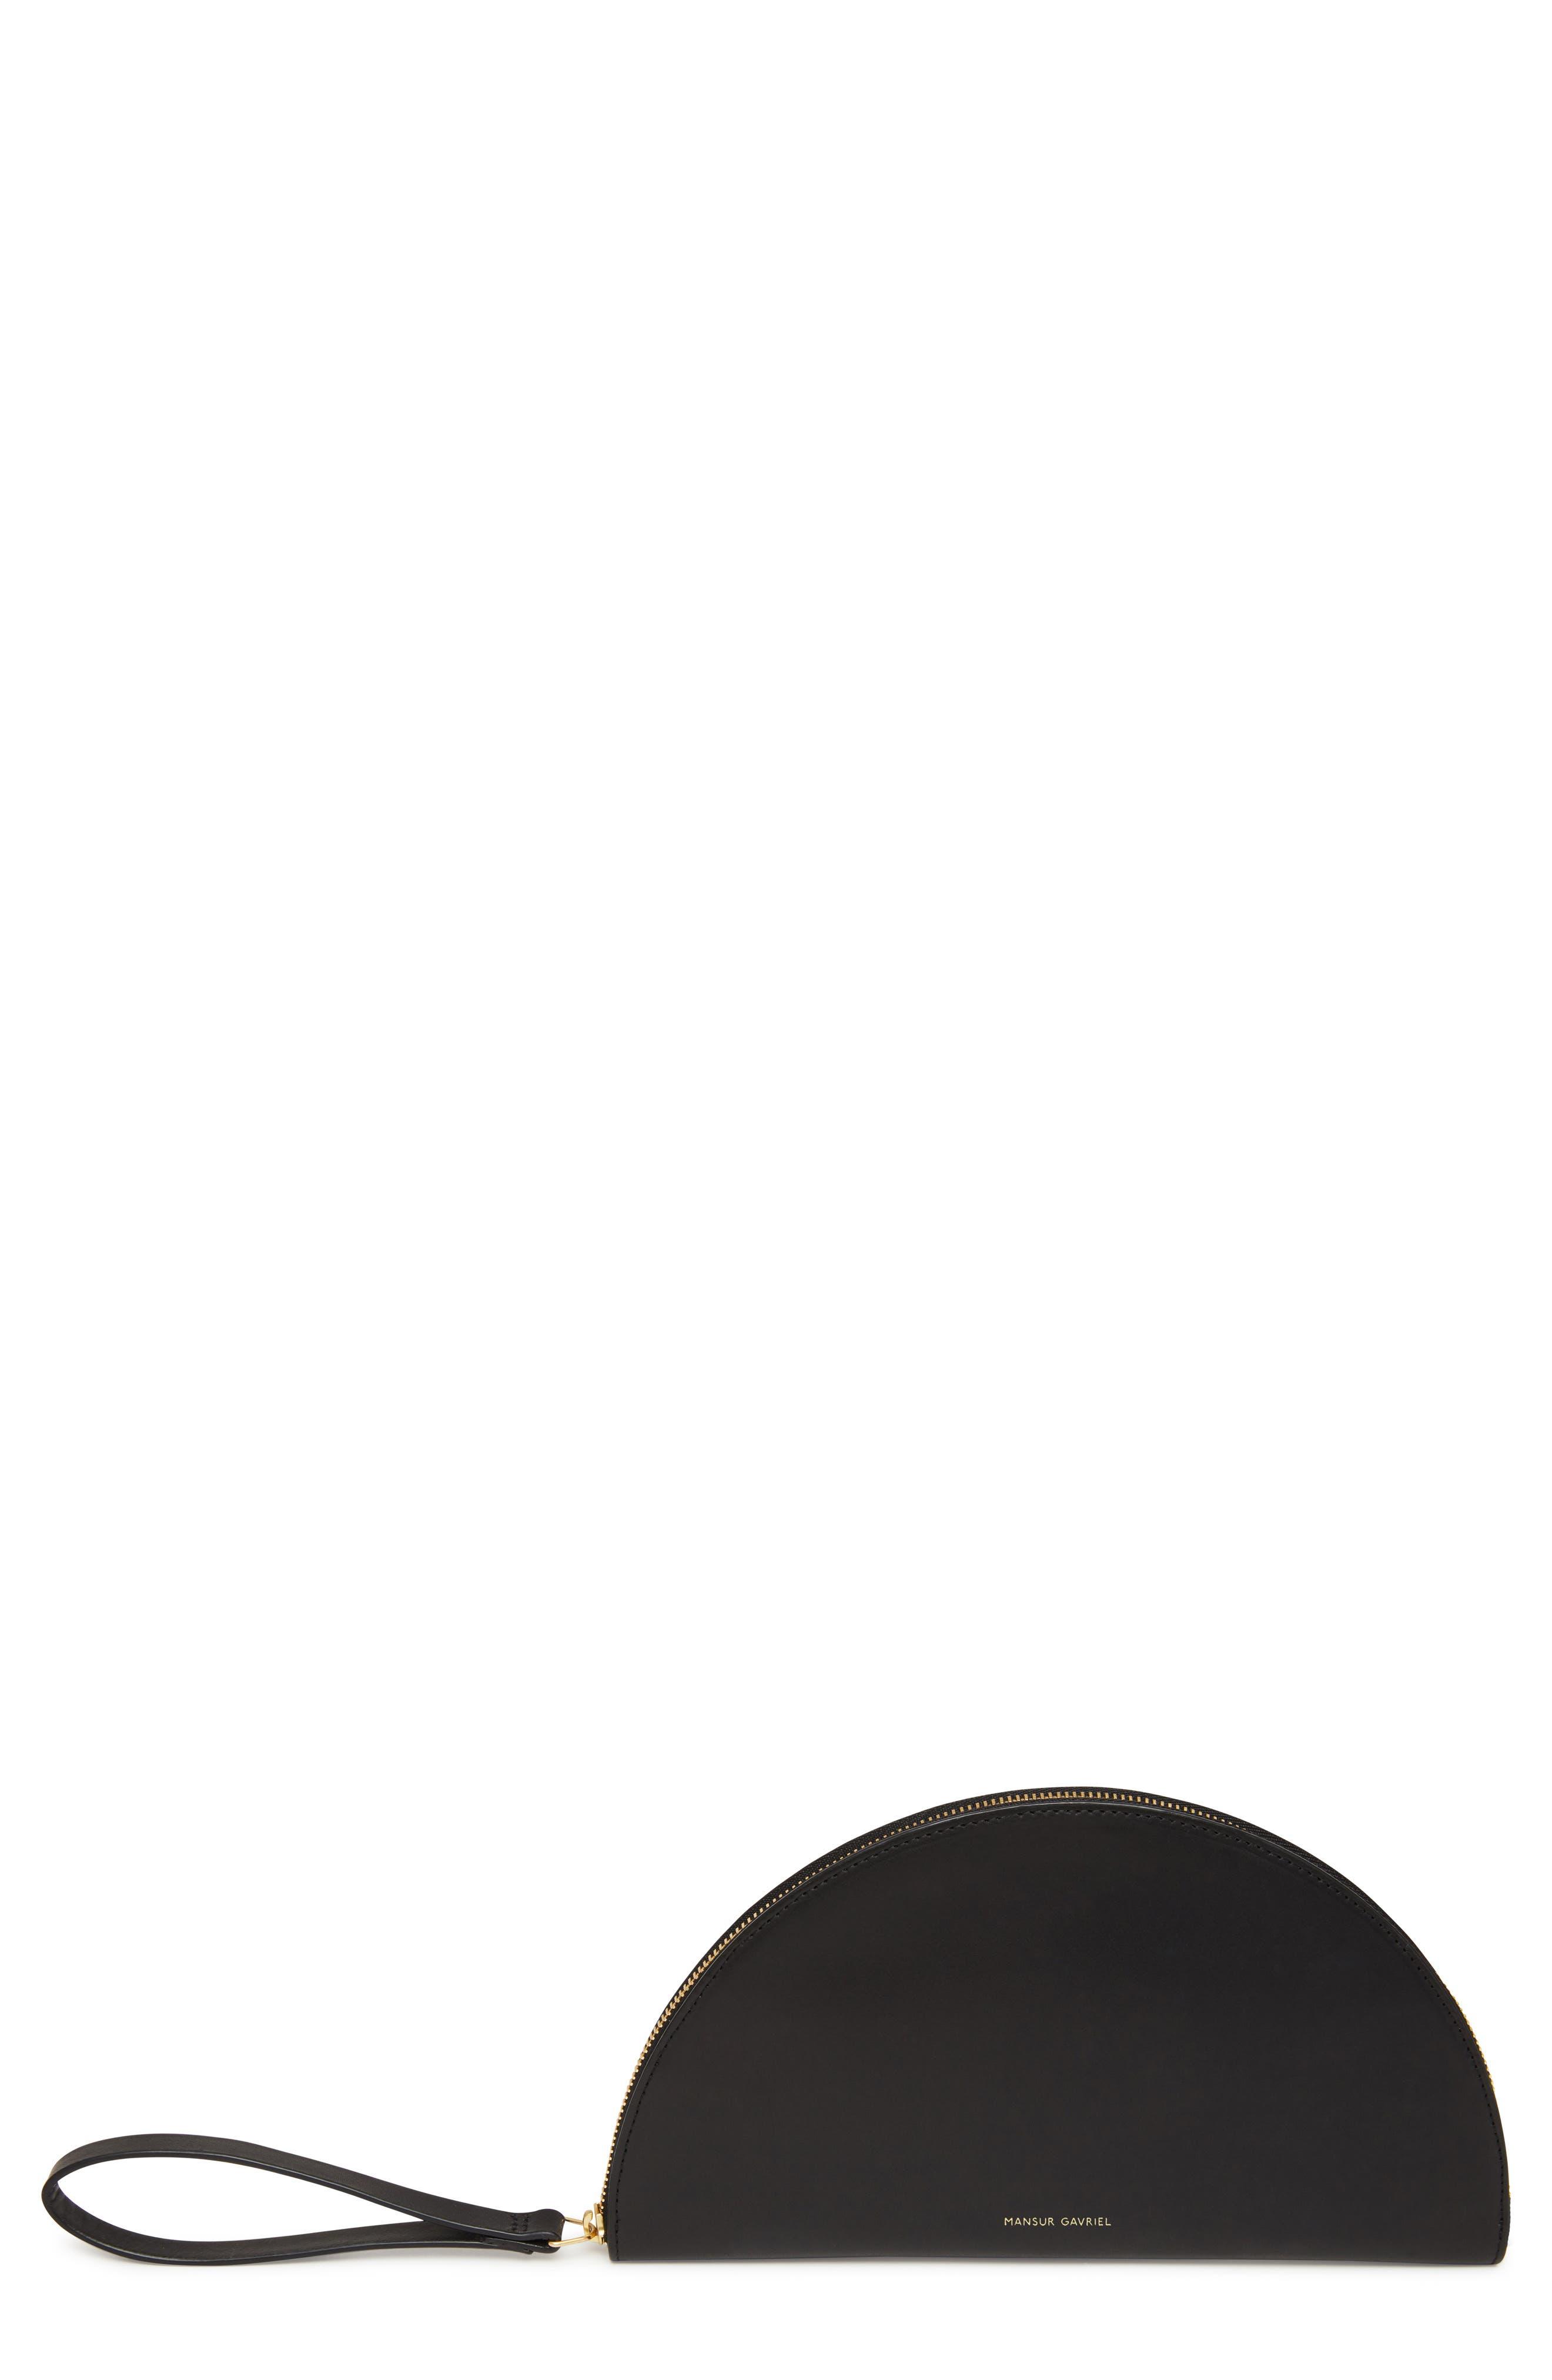 Moon Leather Wallet,                             Main thumbnail 1, color,                             BLACK/ FLAMMA